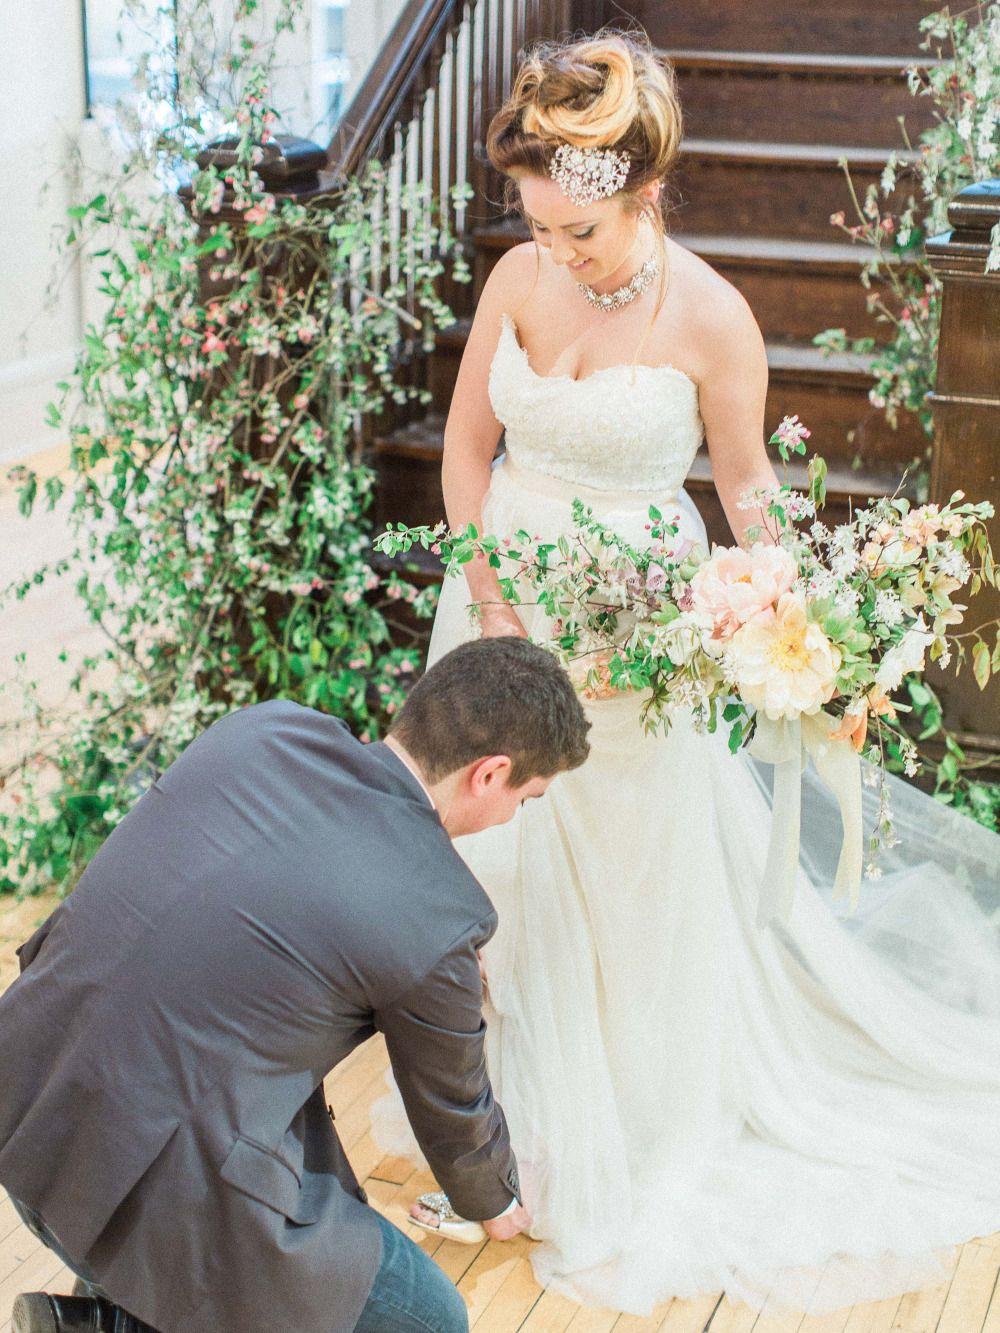 Martin Thornburg Eleanor 119265 Applique Wedding Dress Wedding Dresses Plus Size Plus Wedding Dresses [ 2560 x 1840 Pixel ]